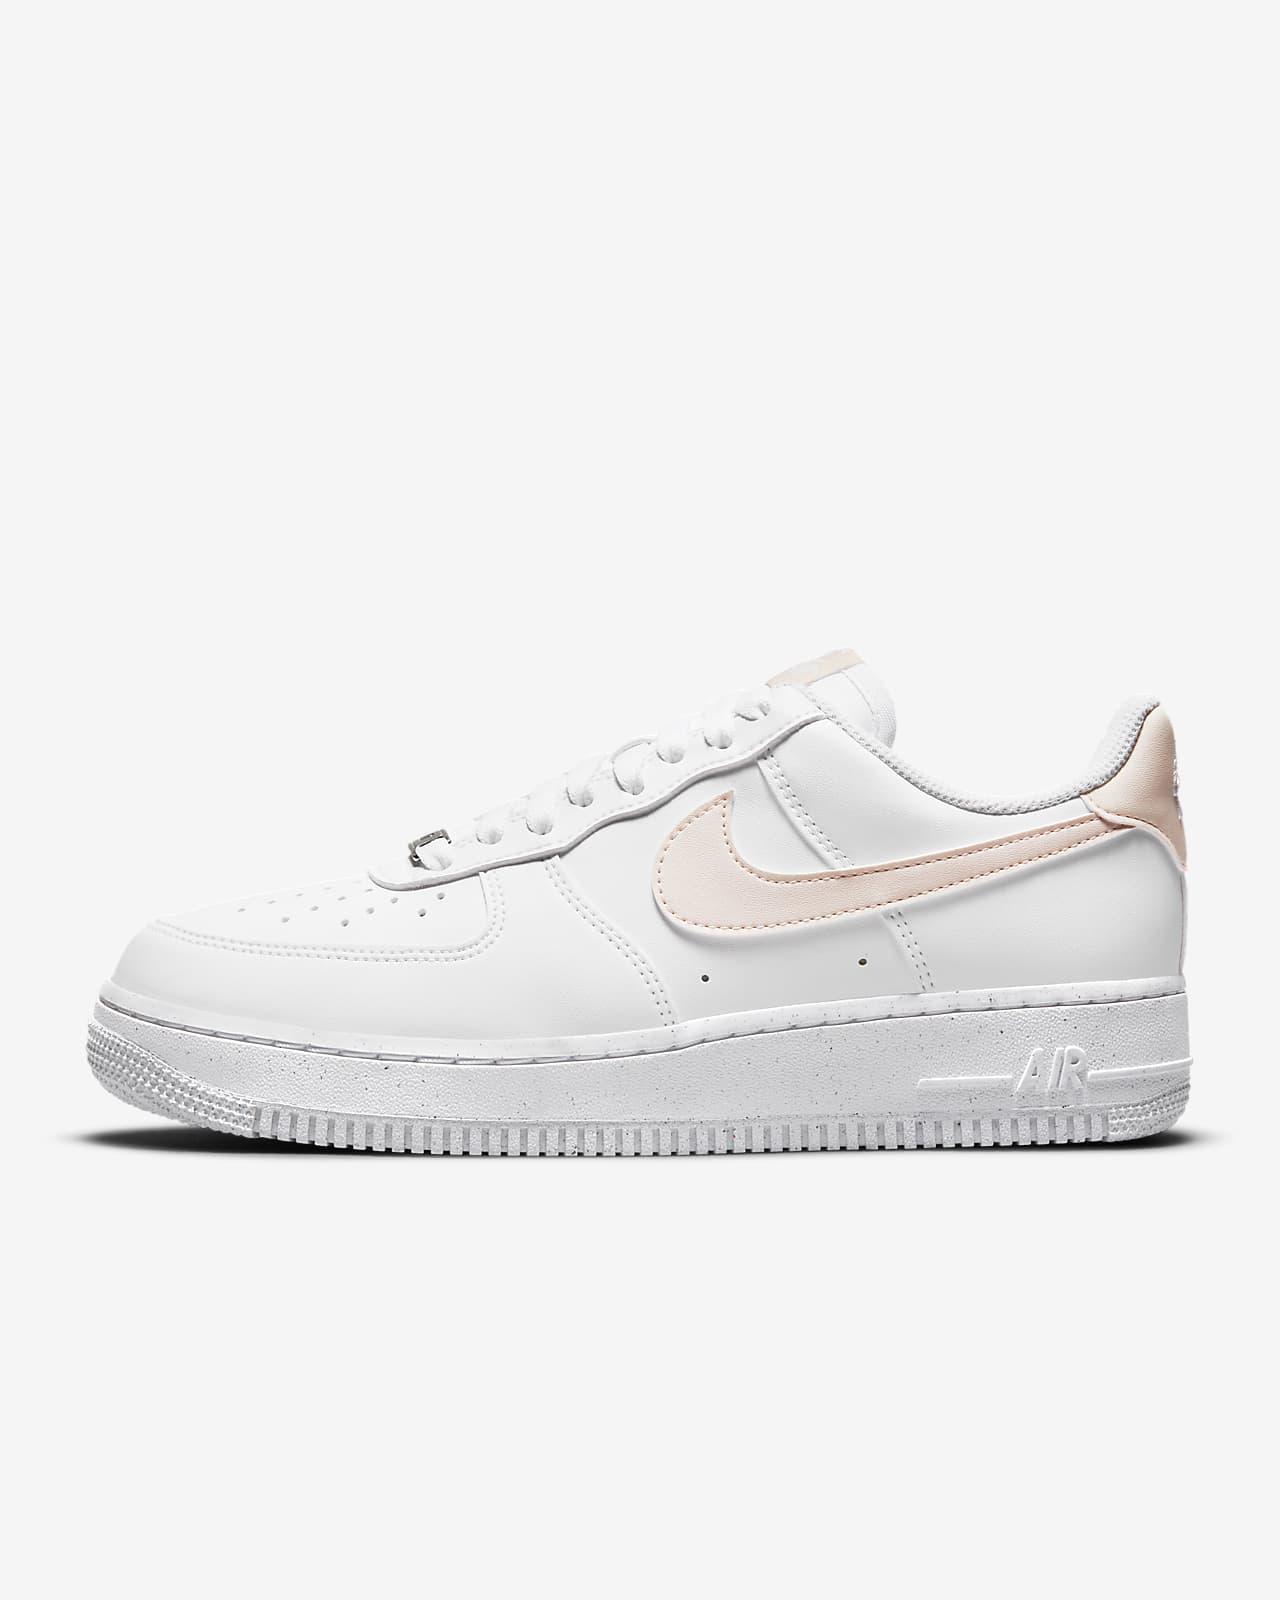 Nike Air Force 1 '07 SE Suede Damenschuh